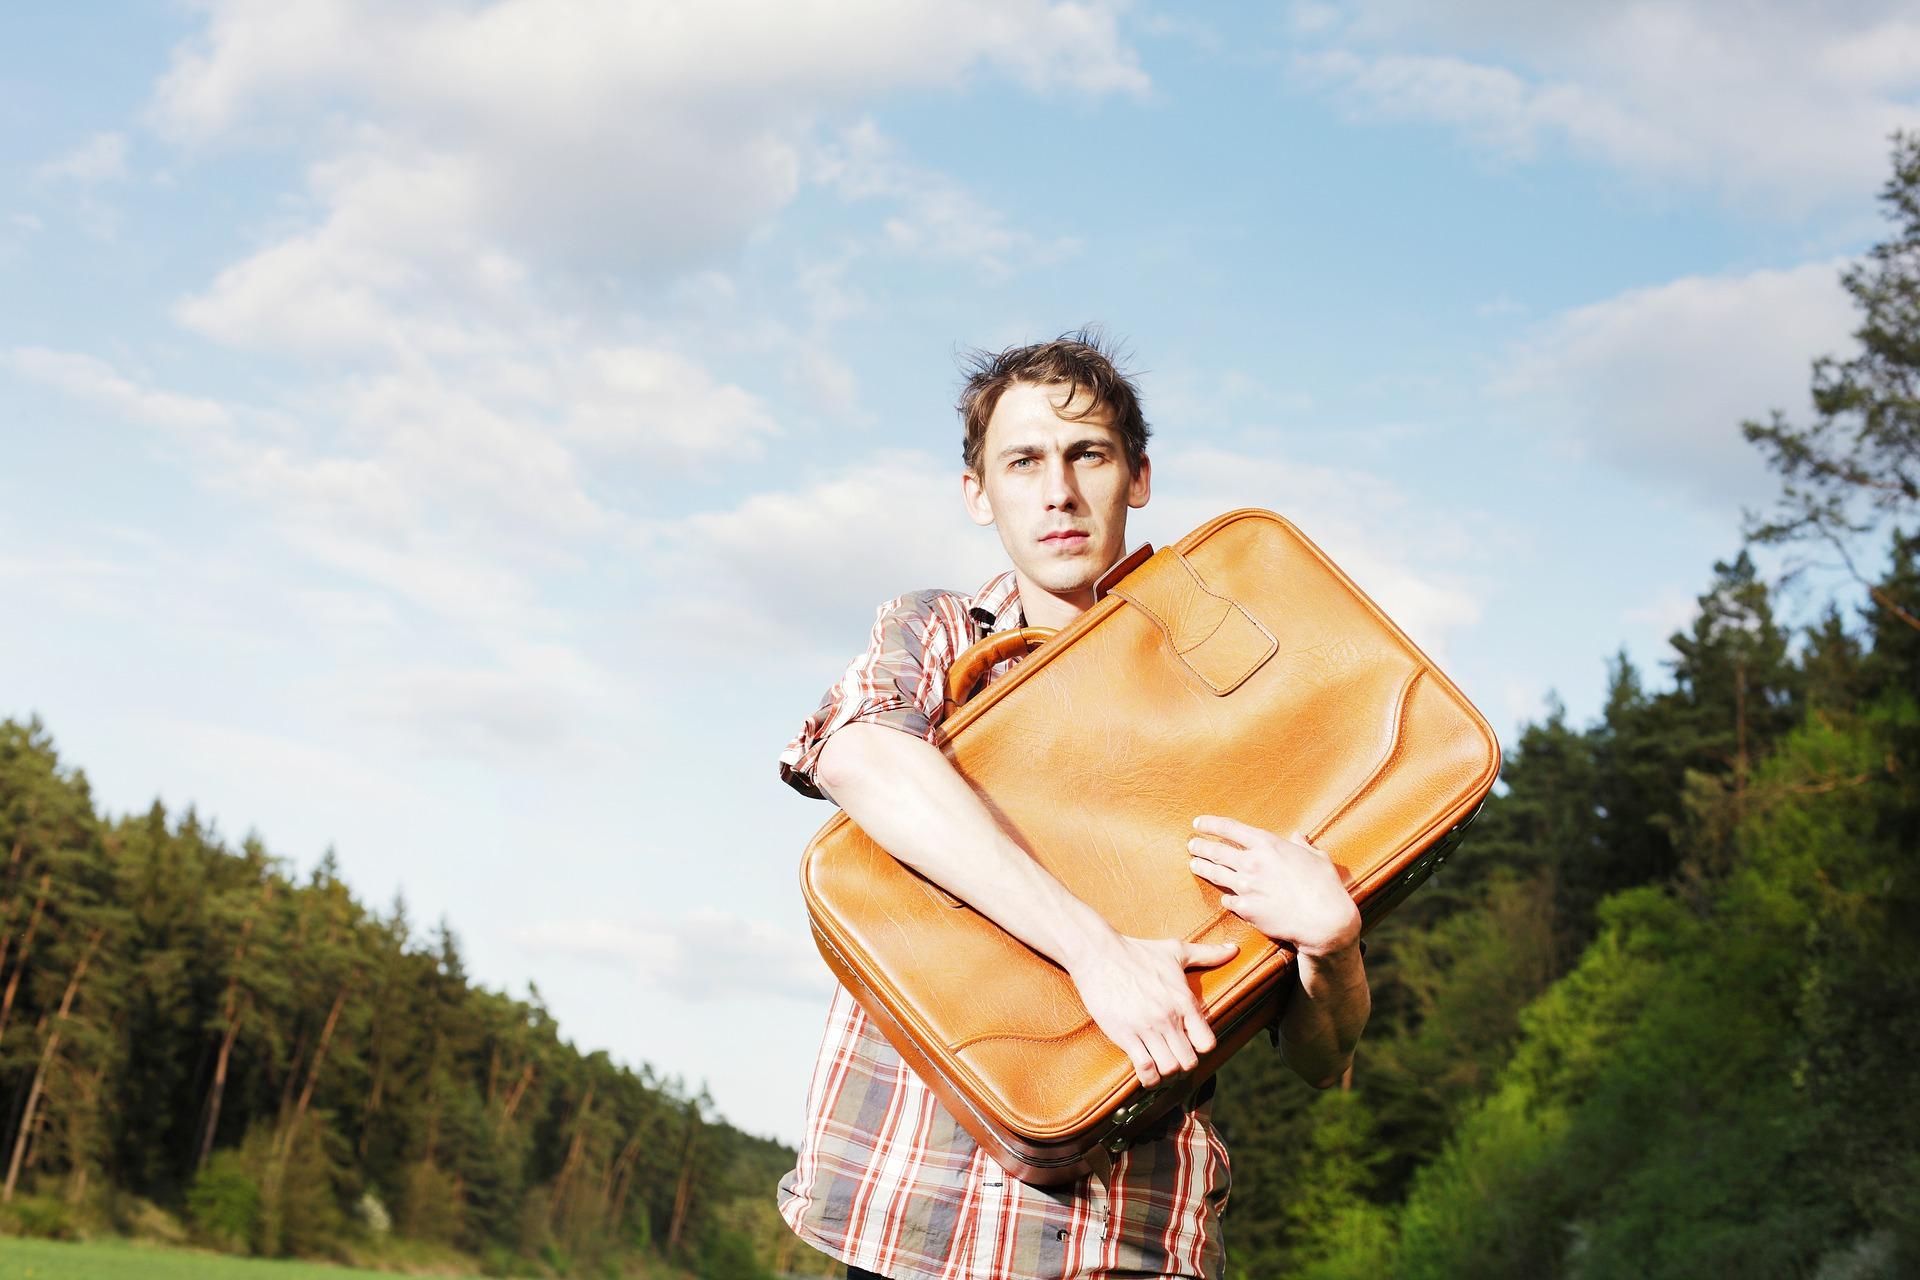 man-suitcase.jpg